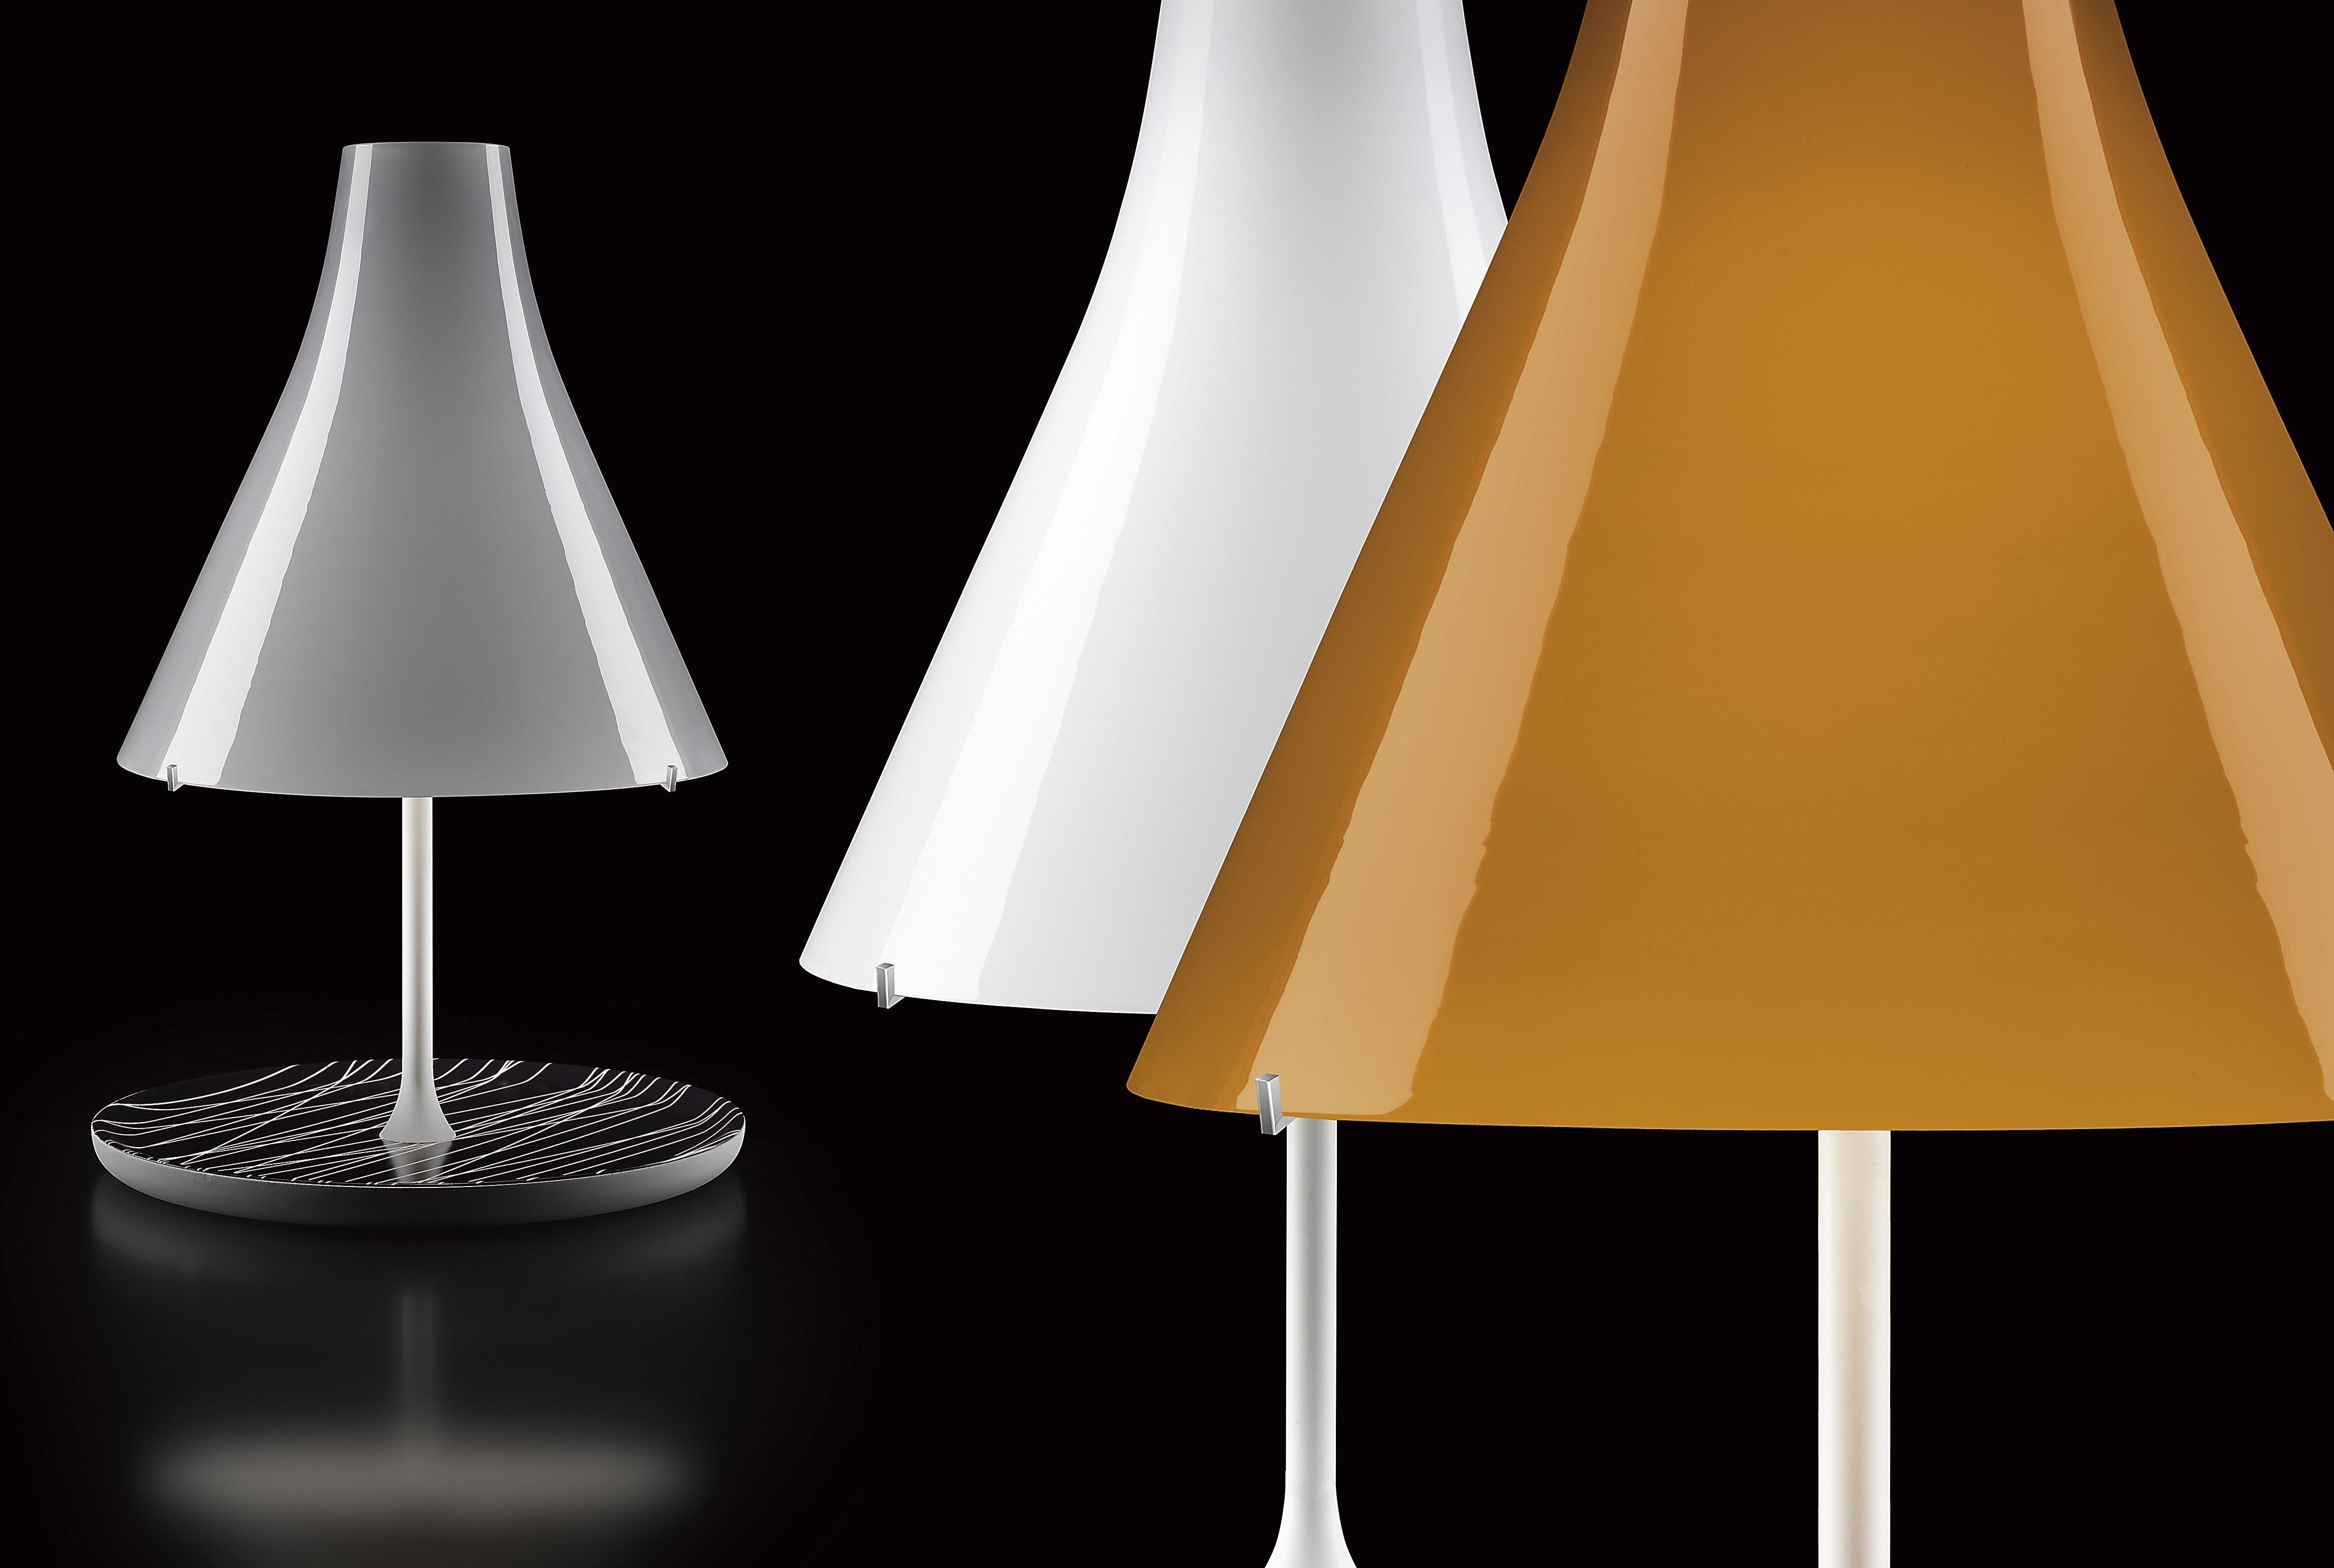 Lampade In Vetro Soffiato : Lampada da tavolo tosca foscarini paralume bianco base bianca